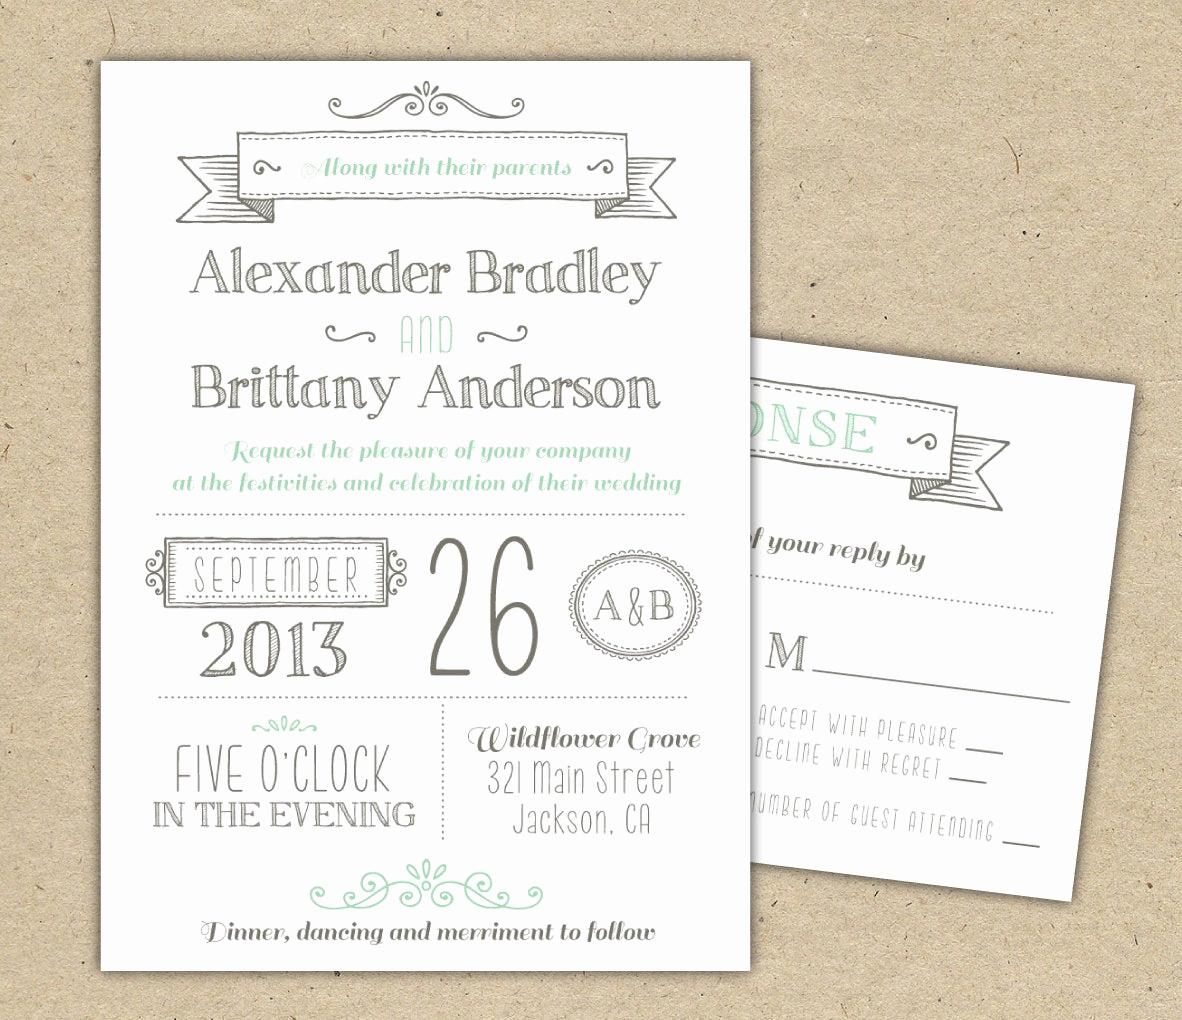 Wedding Invitation Templates Free Awesome Wedding Invitation 1041 Sample Modern Invitation Template